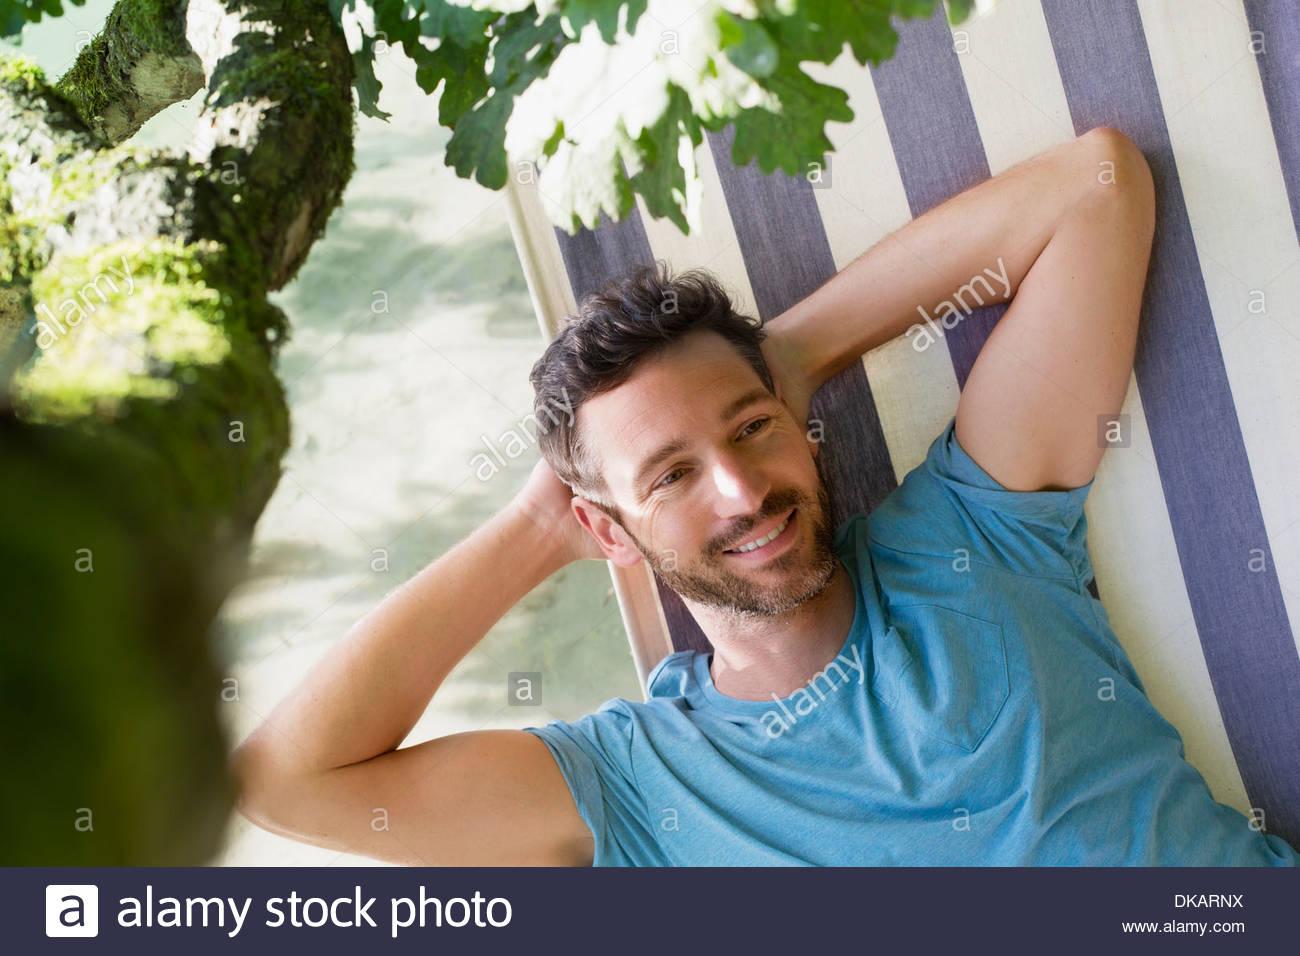 Mature man relaxing in hammock - Stock Image